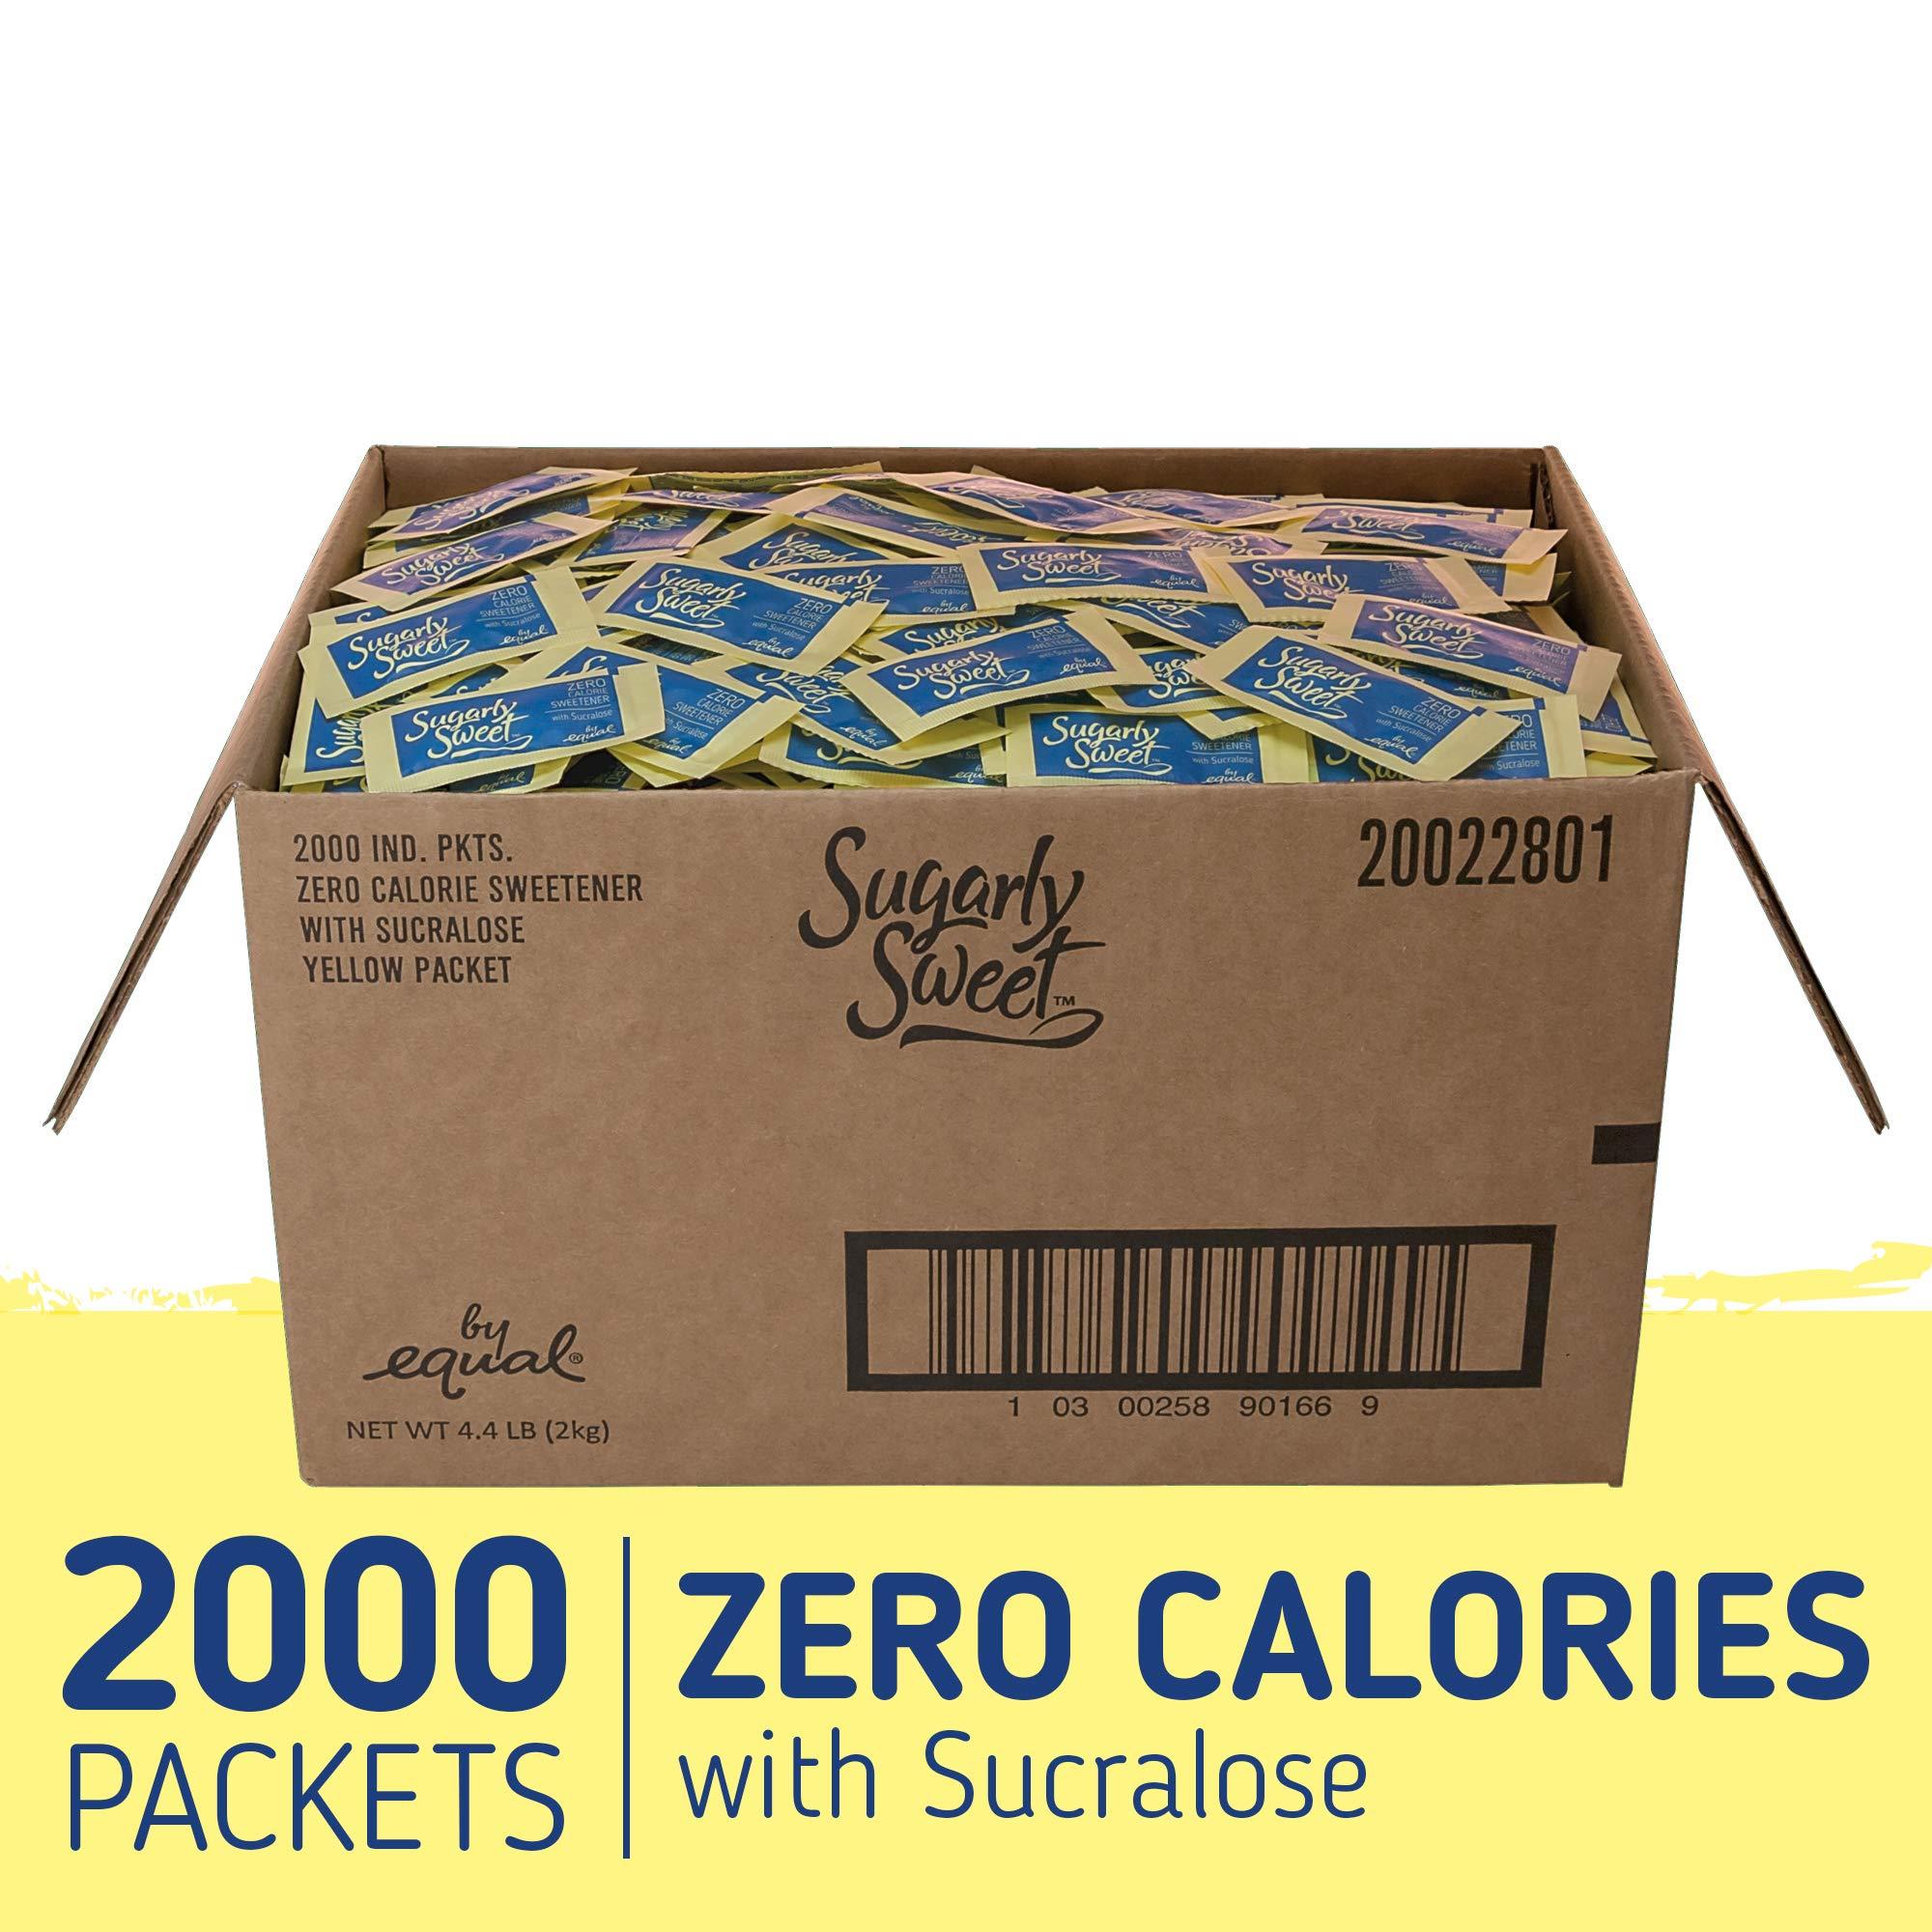 SUGARLY SWEET Zero Calorie Sweetener Packets with Sucralose, Sugar Substitute, Sugar Alternative, Yellow Sweetener Packets, 2,000 Packets